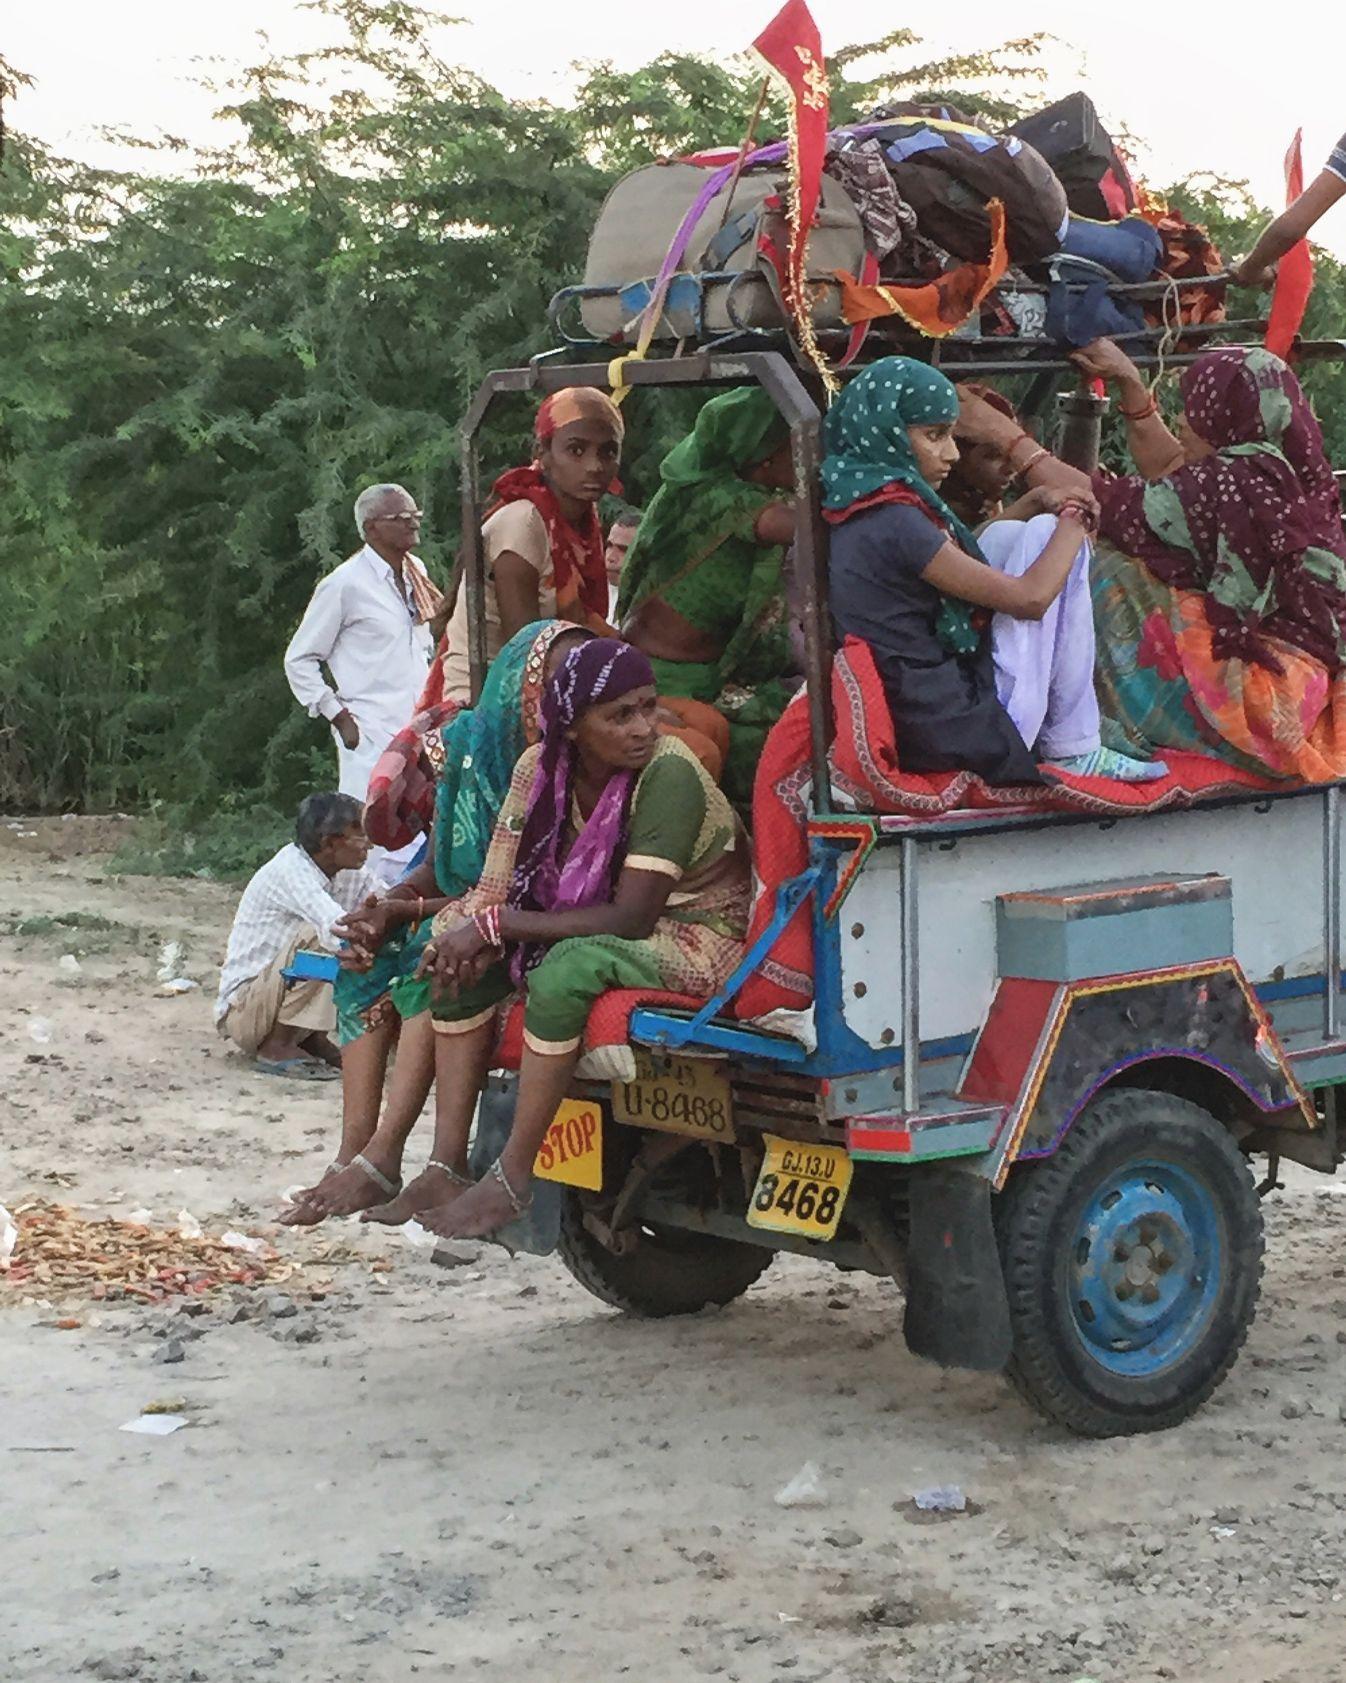 Mata na madh pilgrims